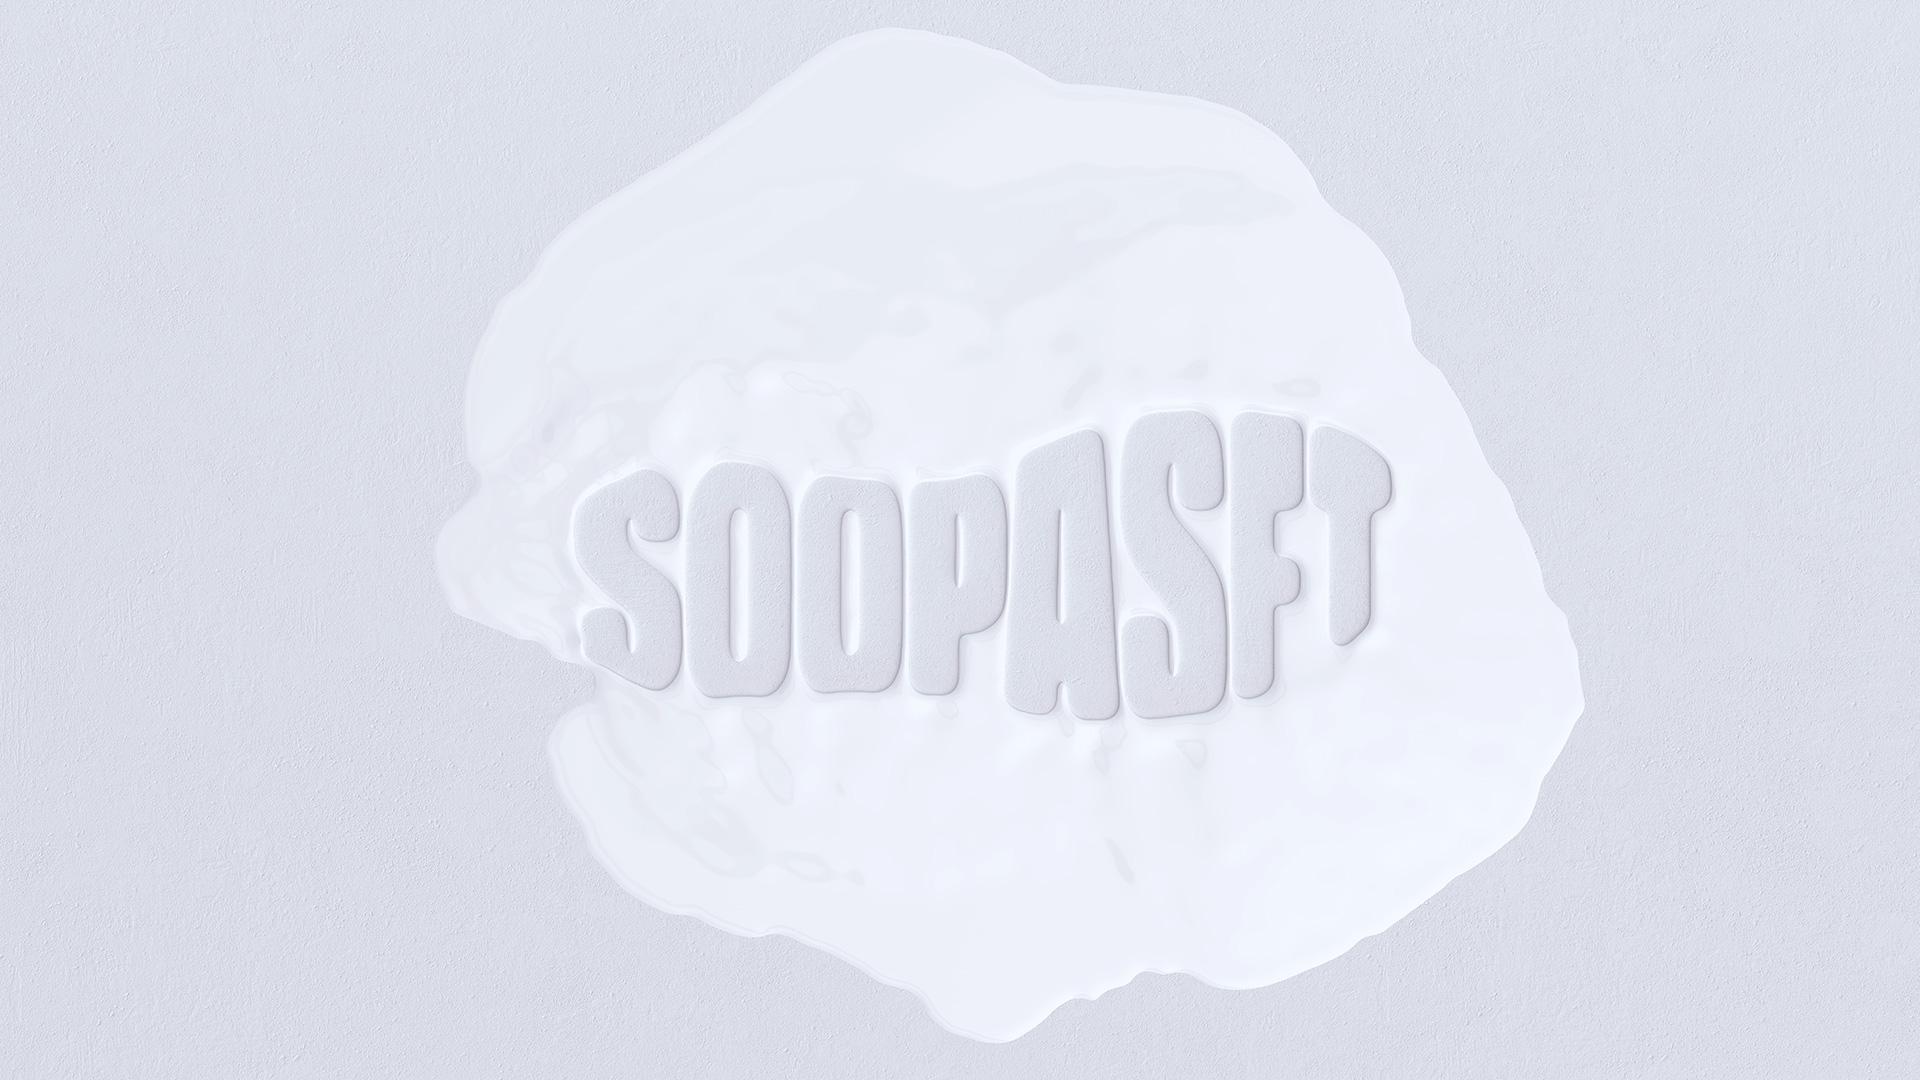 fluid-cgi-animation-image-04